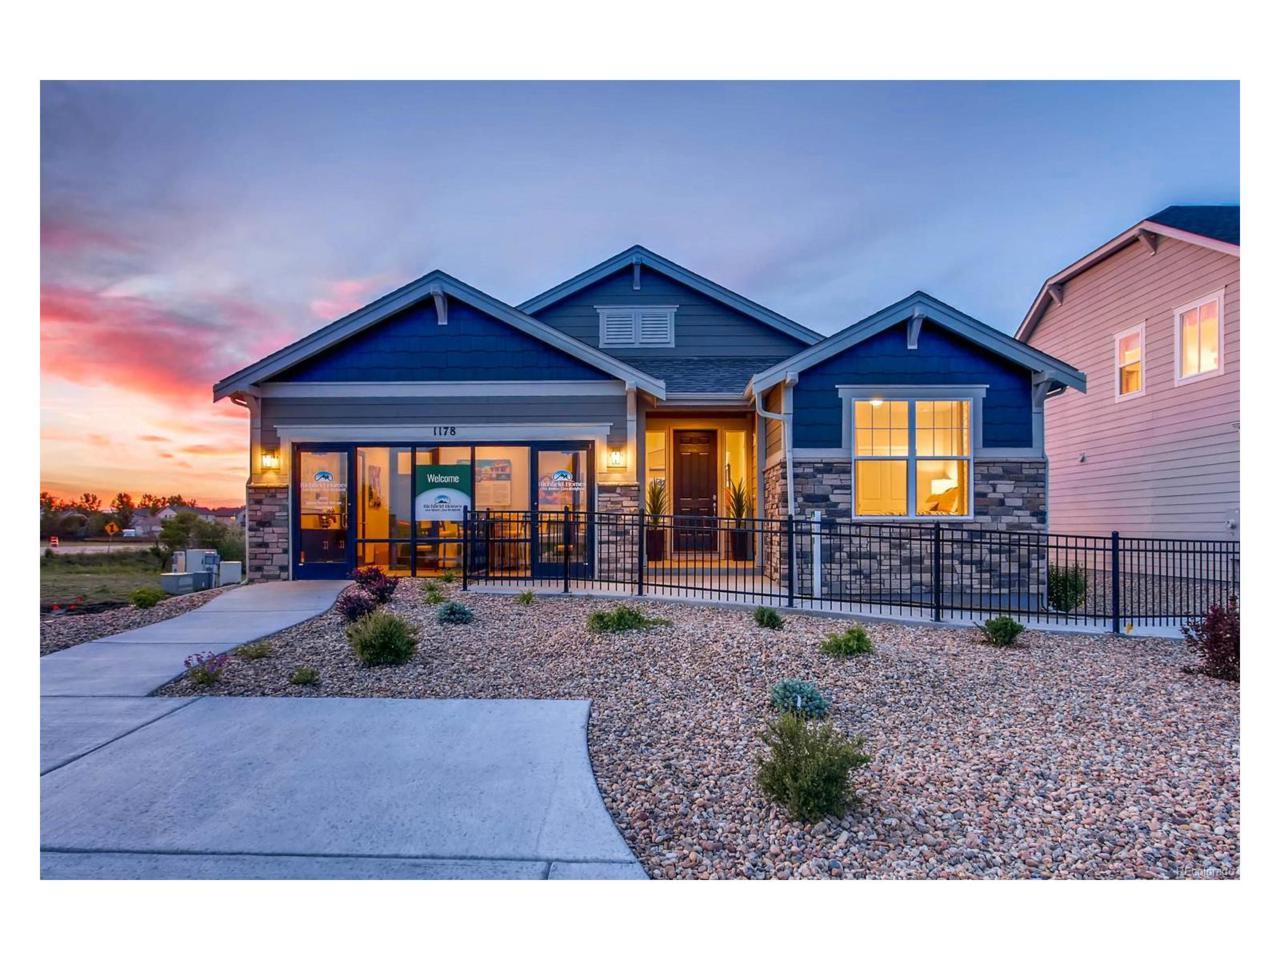 1178 Wagon Bend Road, Berthoud, CO 80513 (MLS #7909663) :: 8z Real Estate